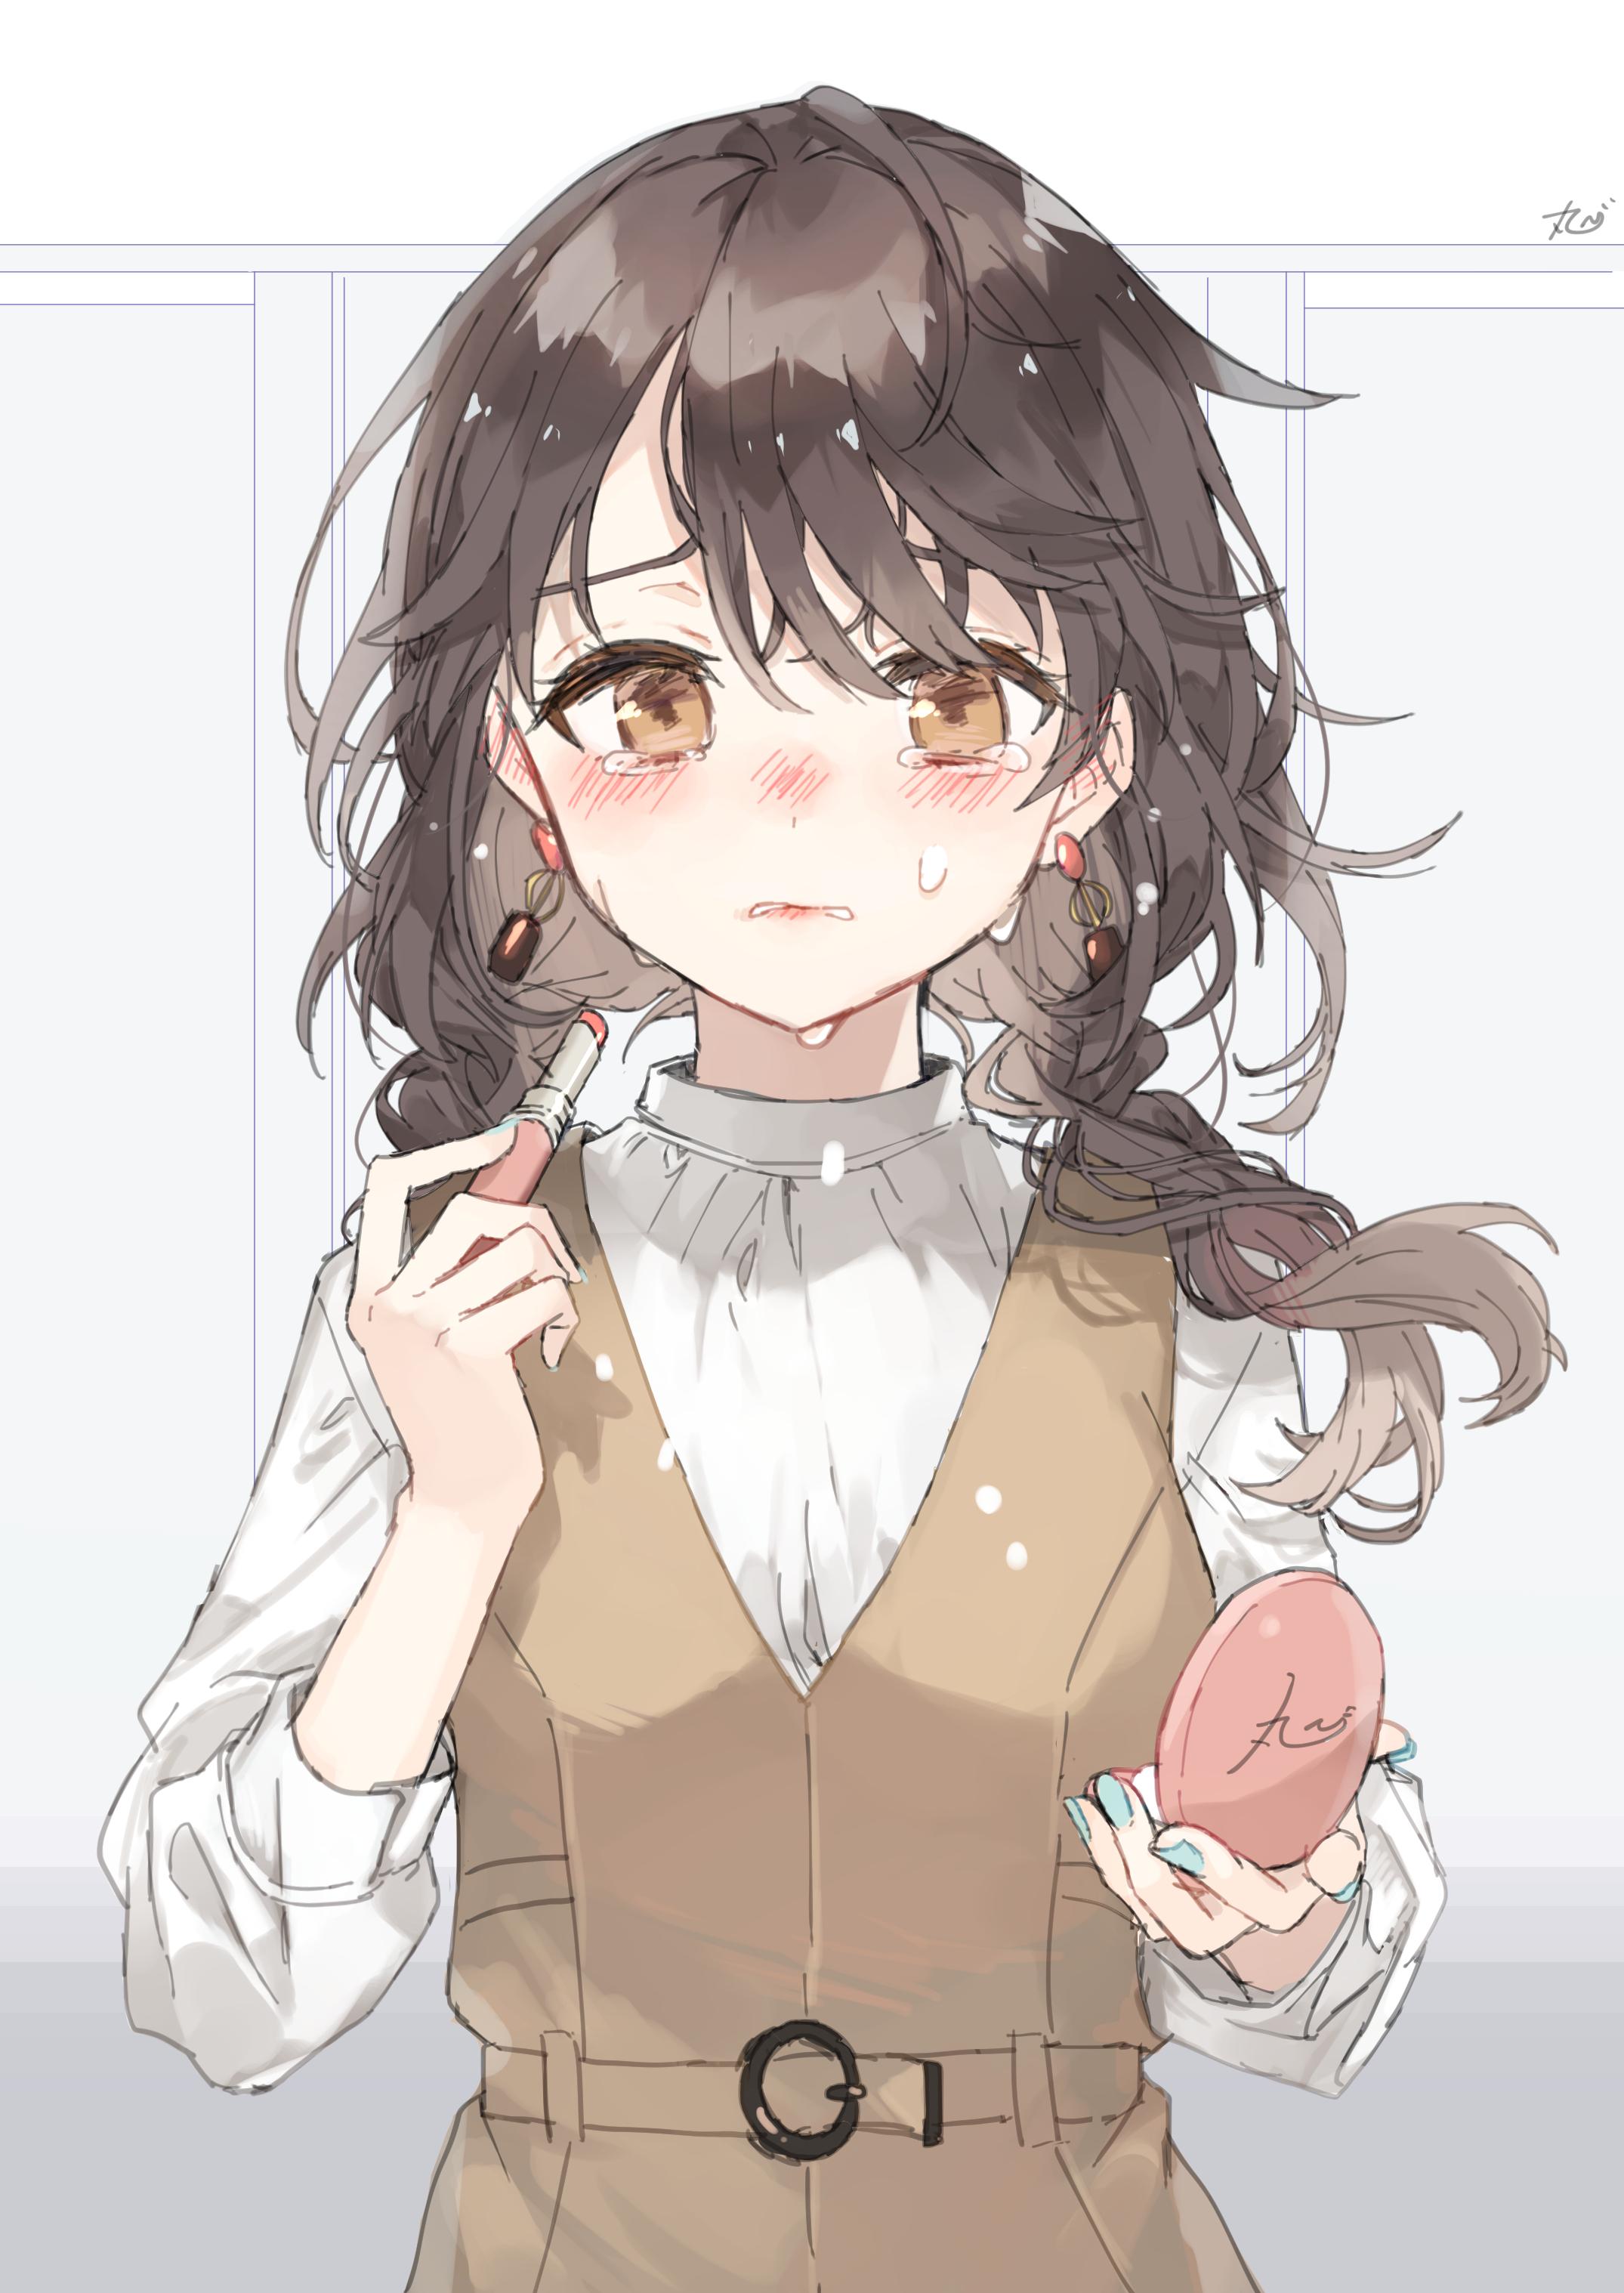 【P站画师】日本画师てび丸的插画作品- ACG17.COM